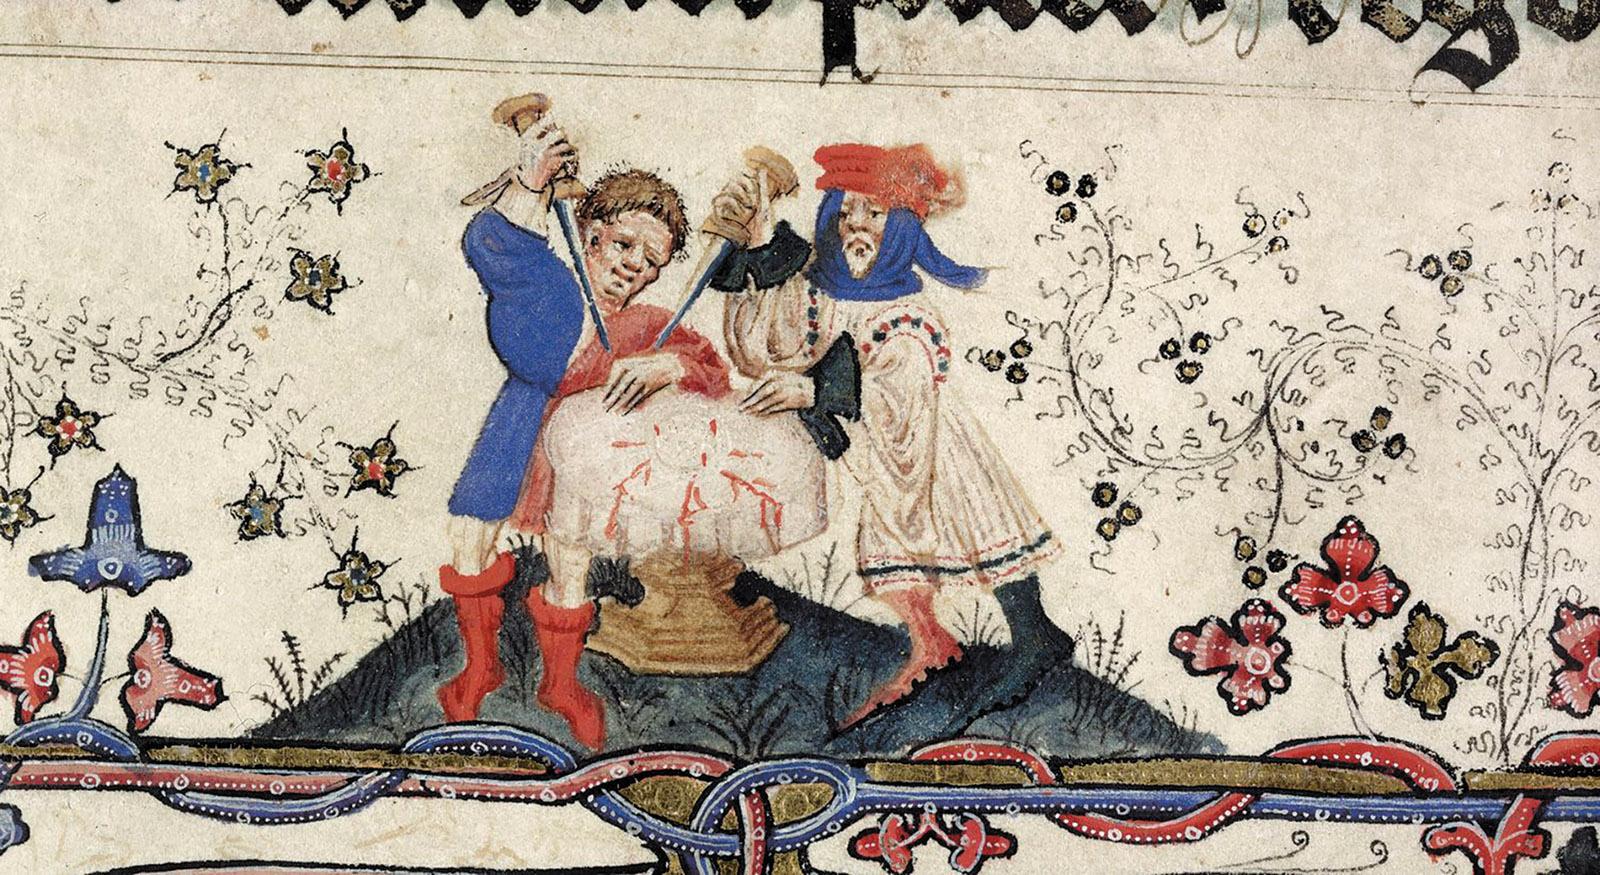 Men desecrating the host, circa 1400